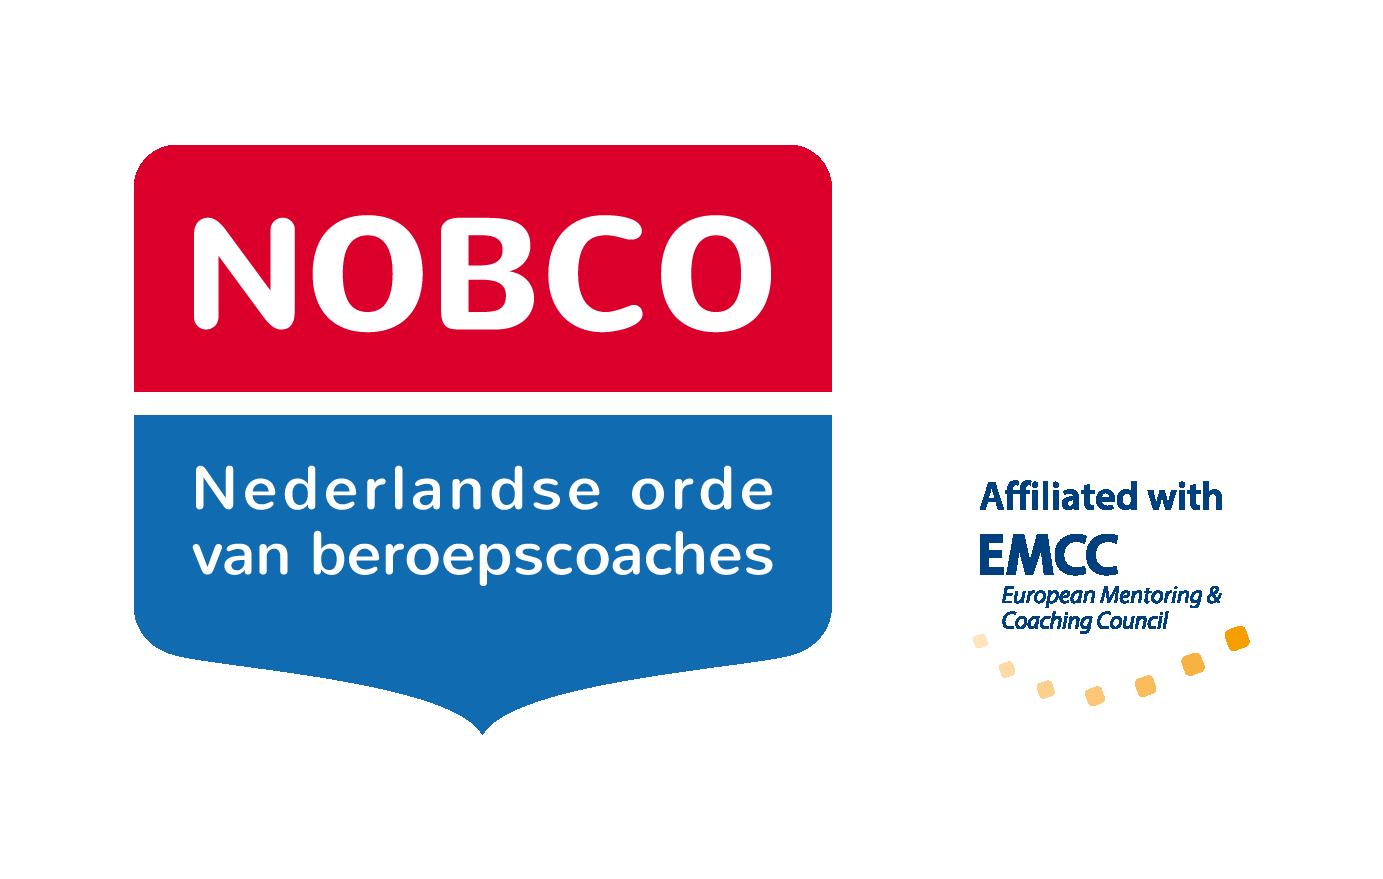 Keurmerk Nederlandse Orde van Beroepscoaches